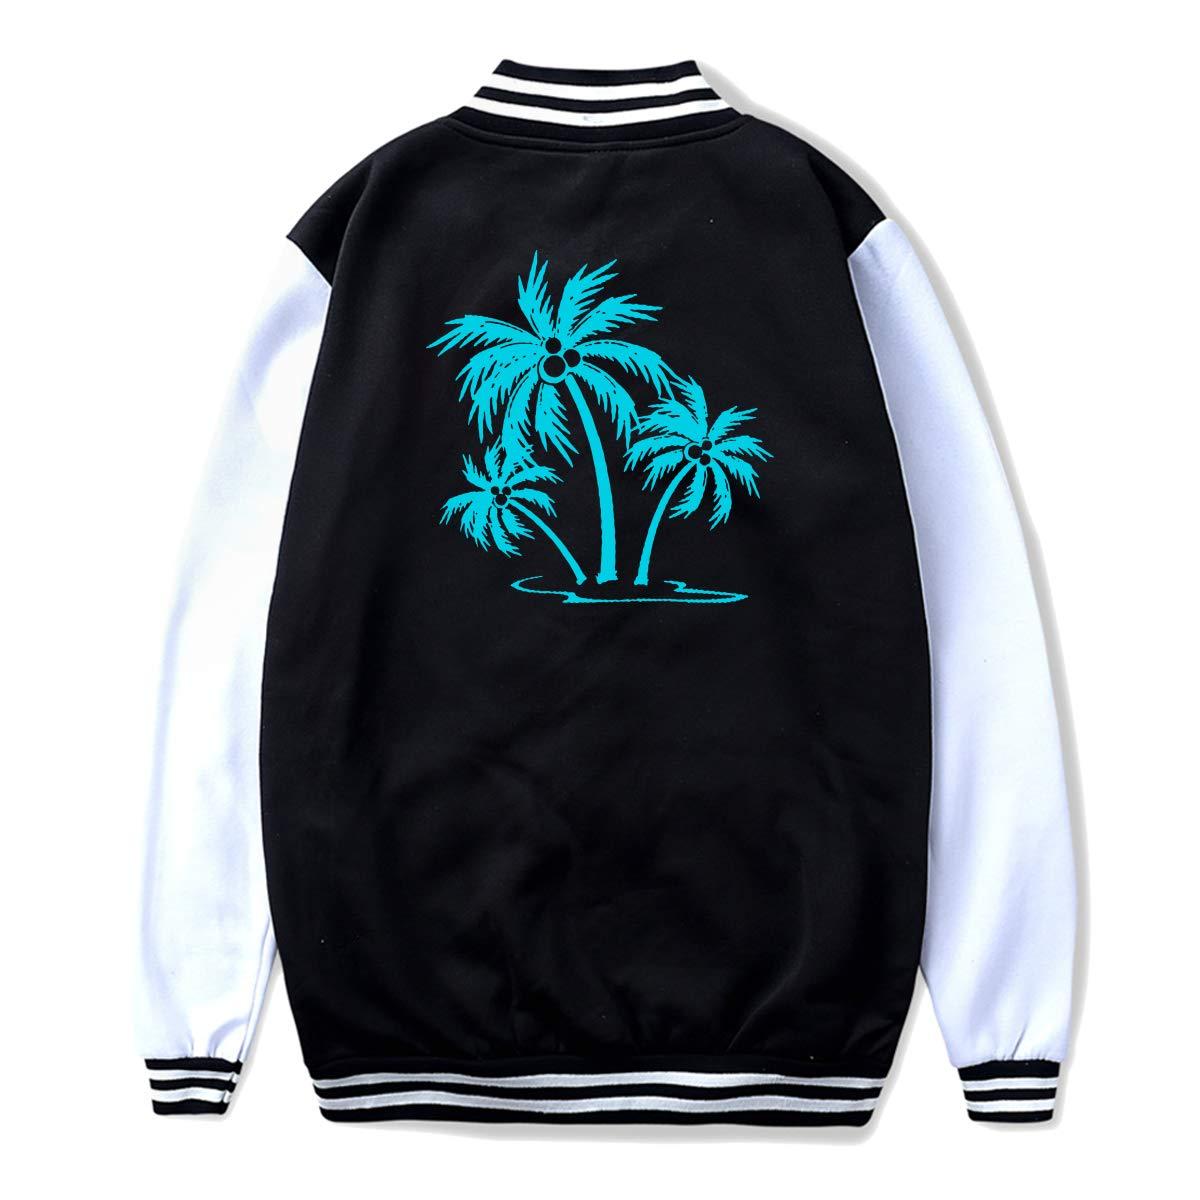 NJKM5MJ Unisex Teen Baseball Uniform Jacket Palm Tree Coat Sport Outfit Back Print